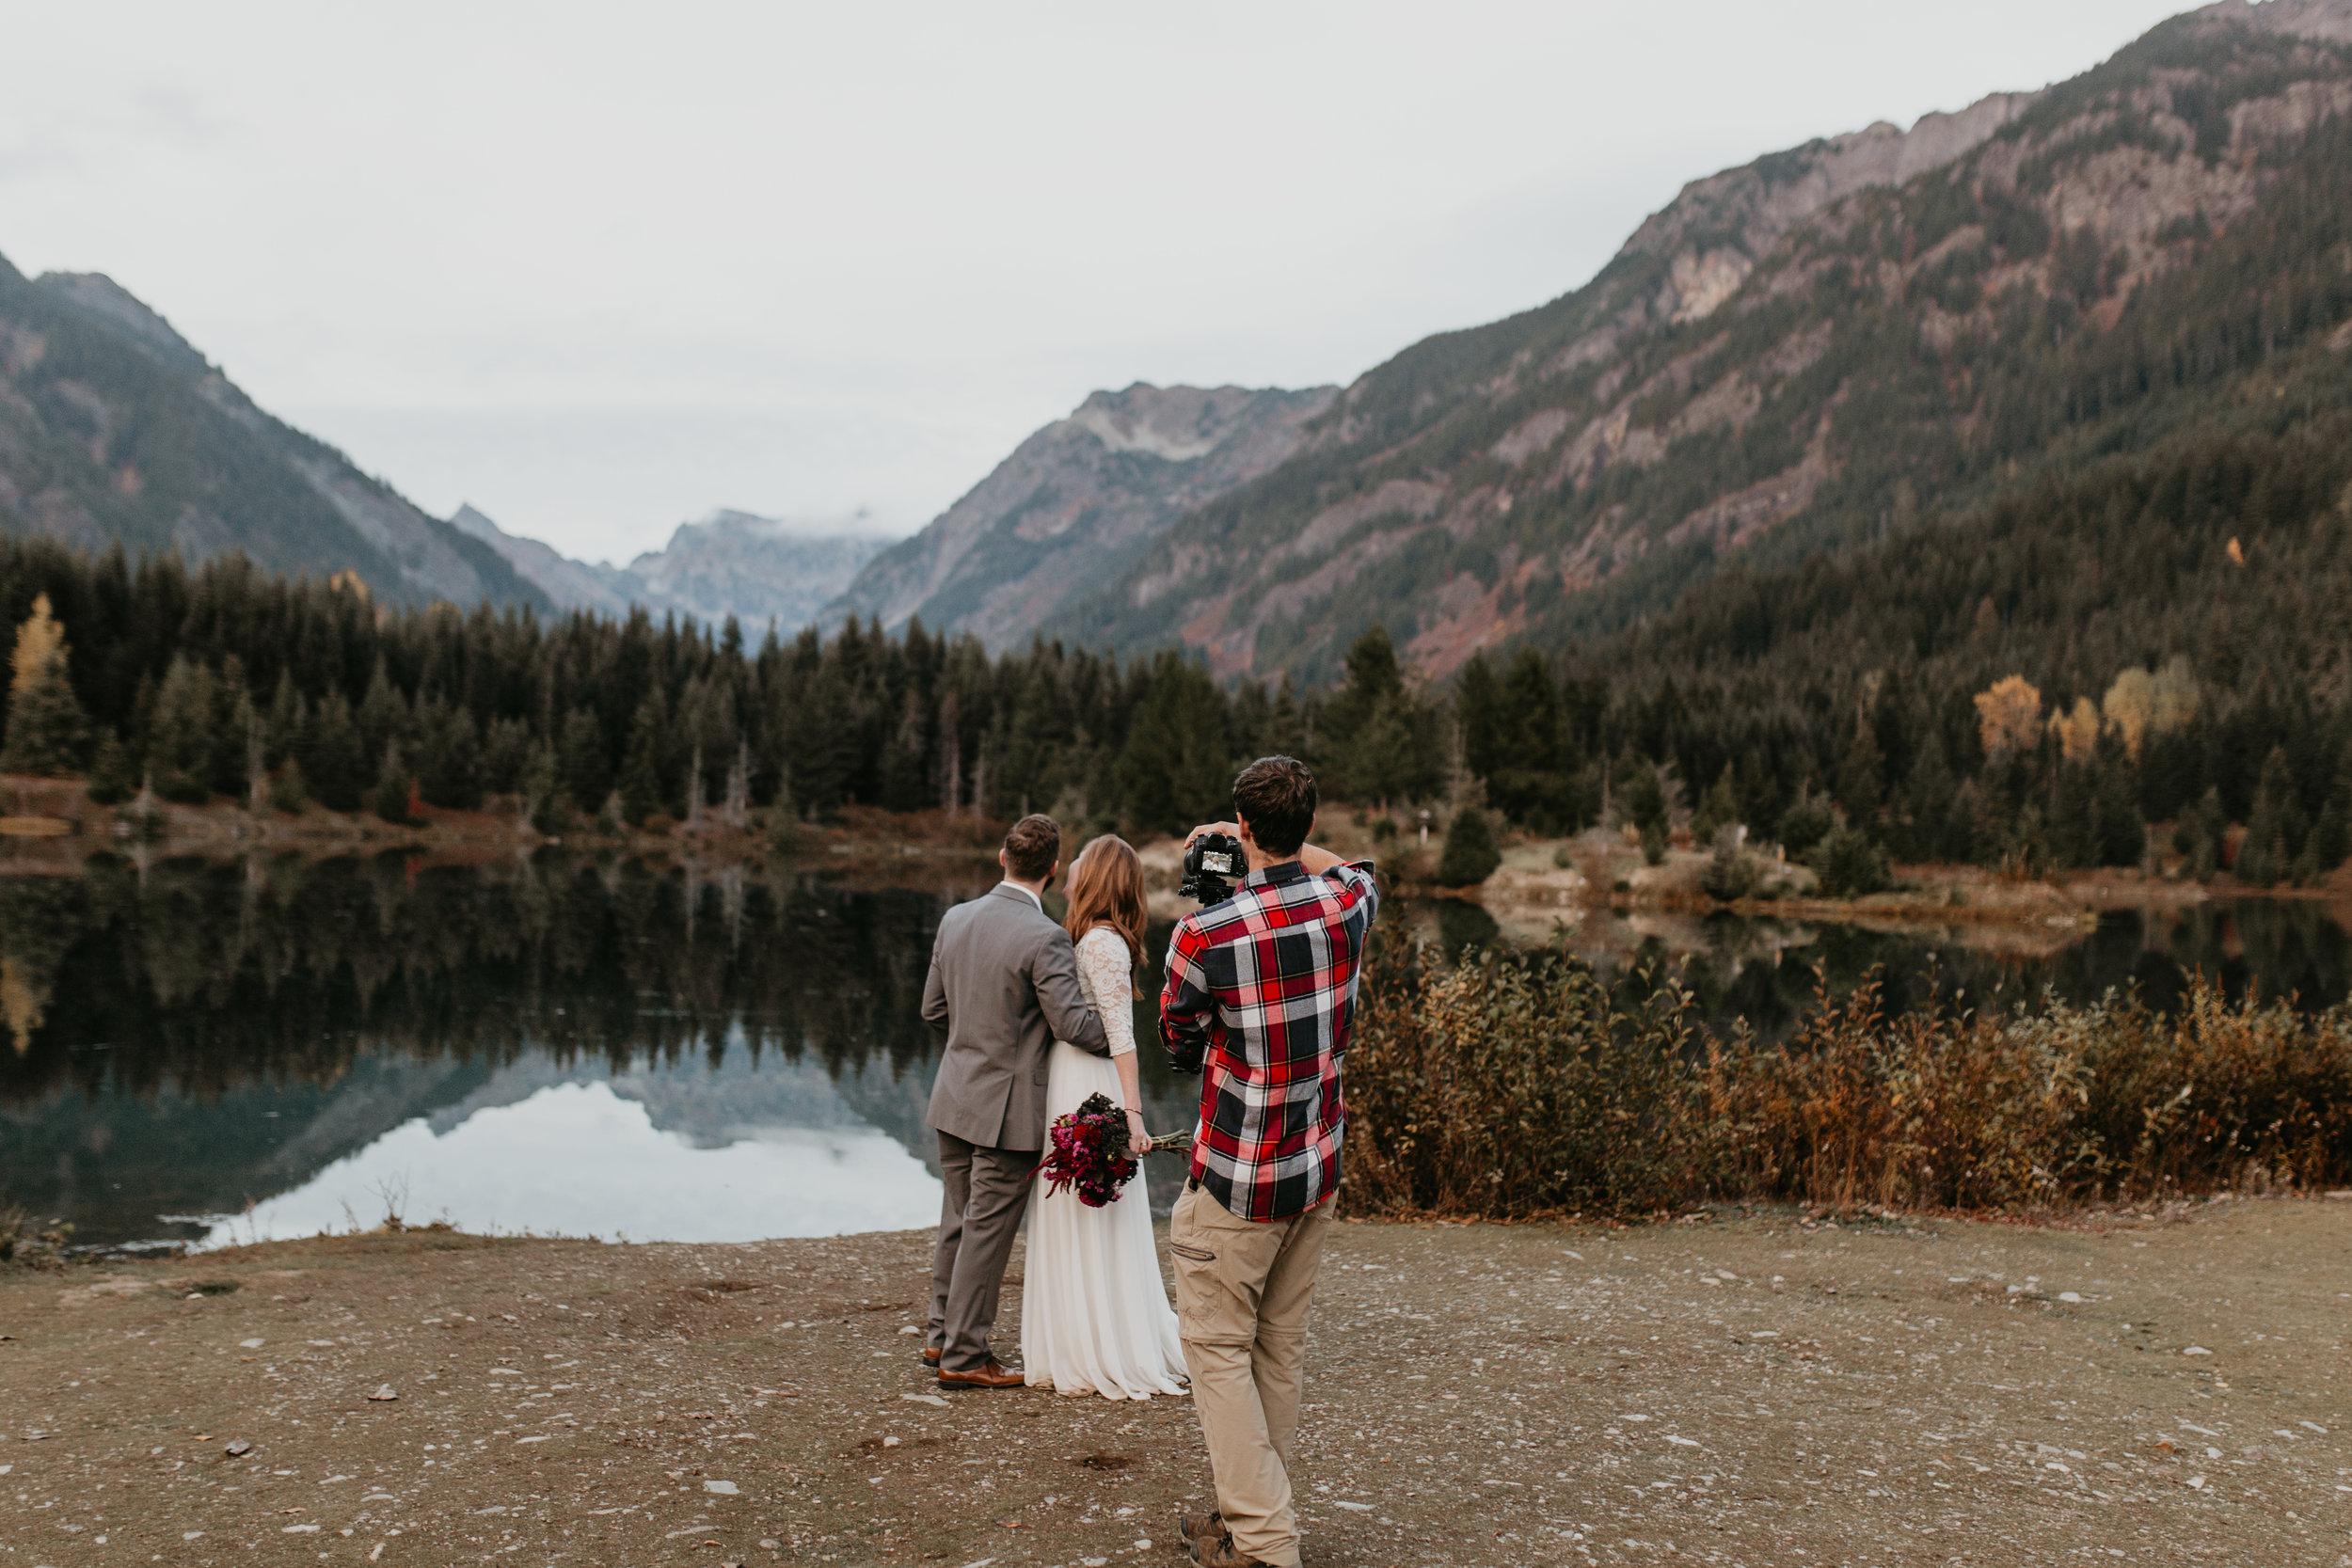 nicole-daacke-photography-mountain-view-elopement-at-gold-creek-pond-snoqualmie-washington-wa-elopement-photographer-photography-adventure-elopement-in-washington-fall-lakeside-golden-sunset-boho-fun-bride-0616.jpg